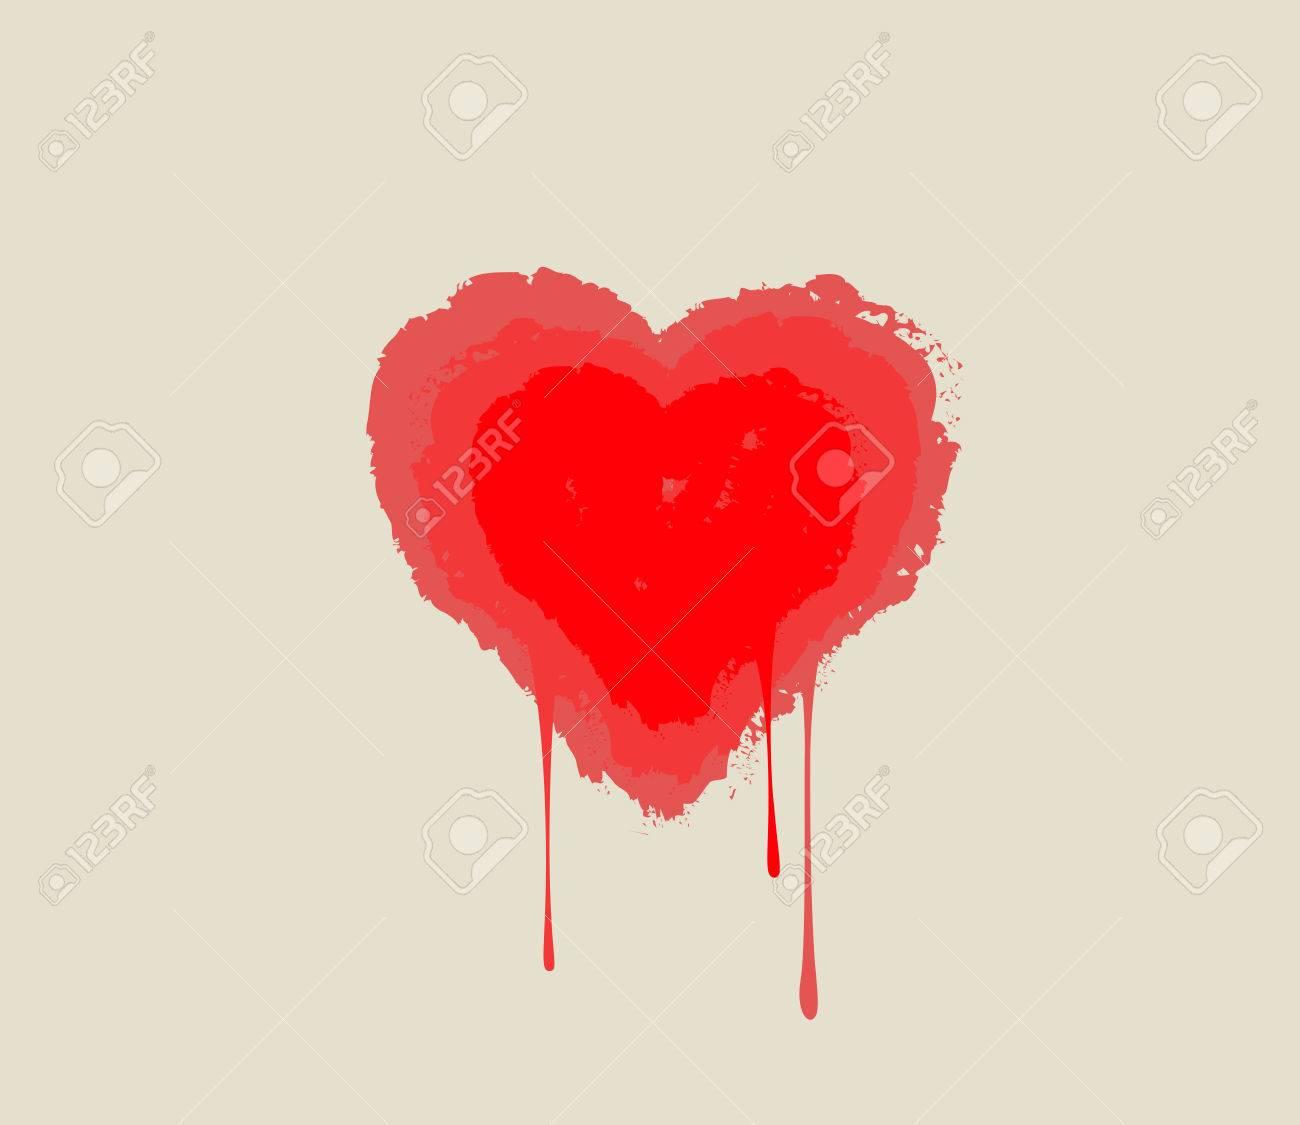 Bleeding heart heart melting in drops love symbol royalty free bleeding heart heart melting in drops love symbol stock vector 45501373 buycottarizona